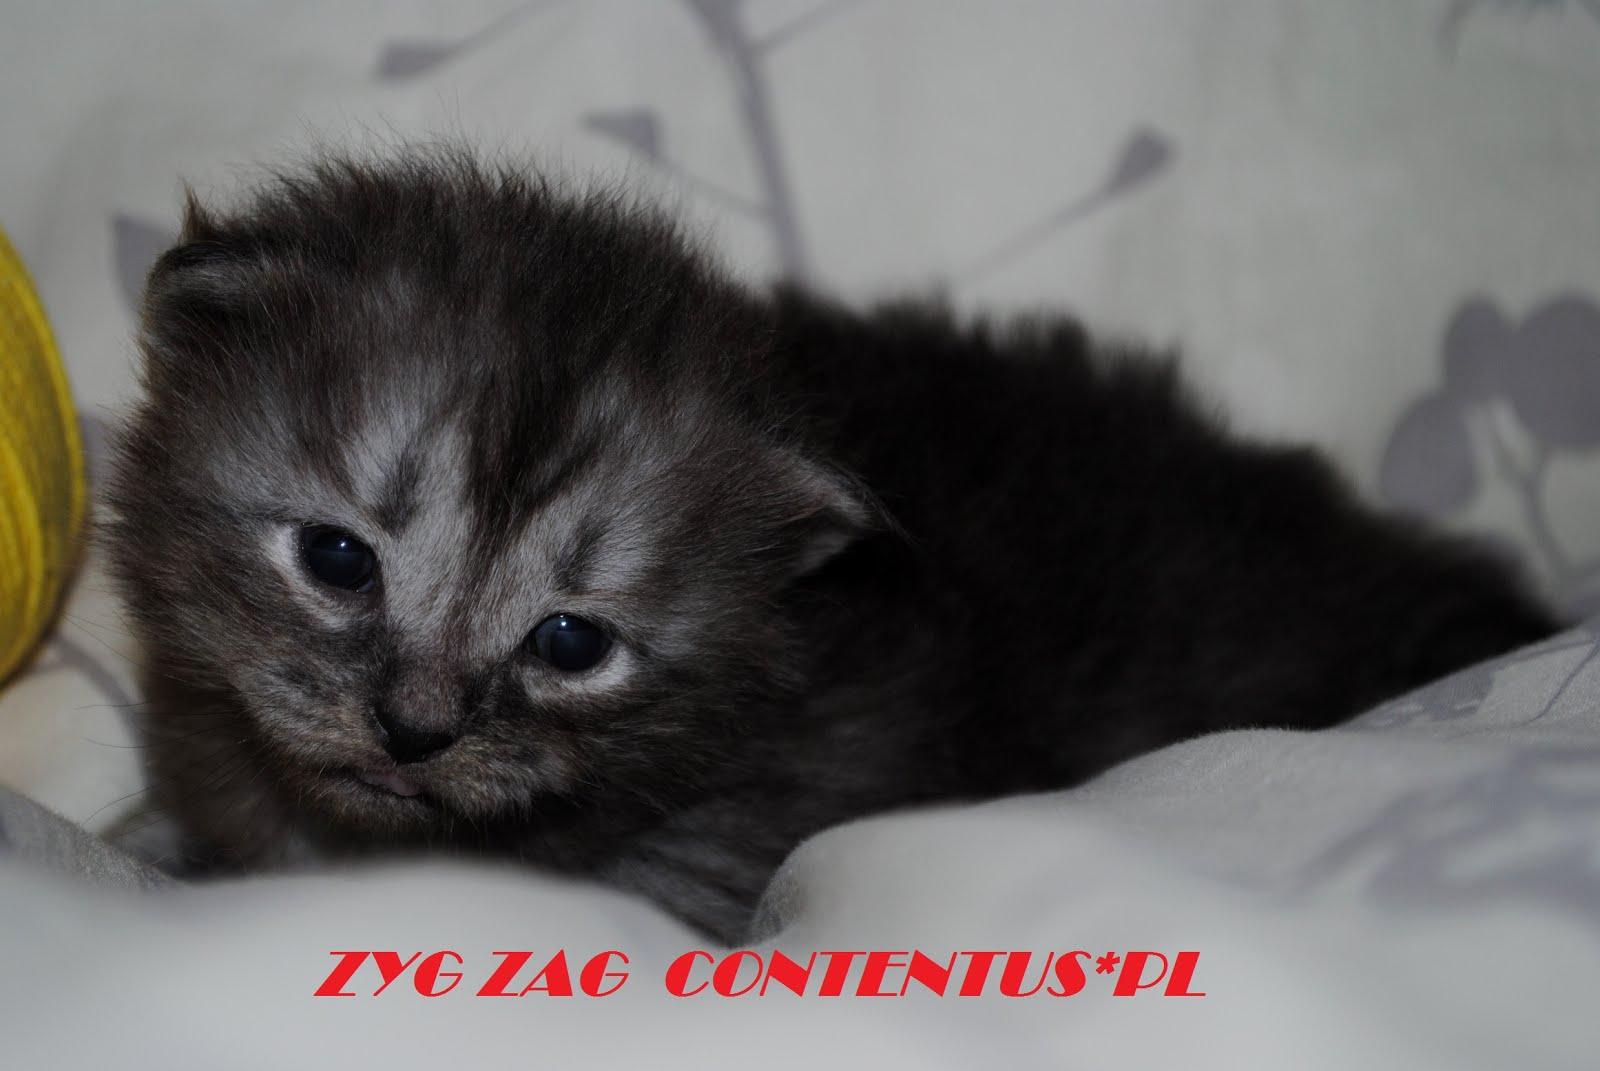 ZYG ZAG Contentus*PL